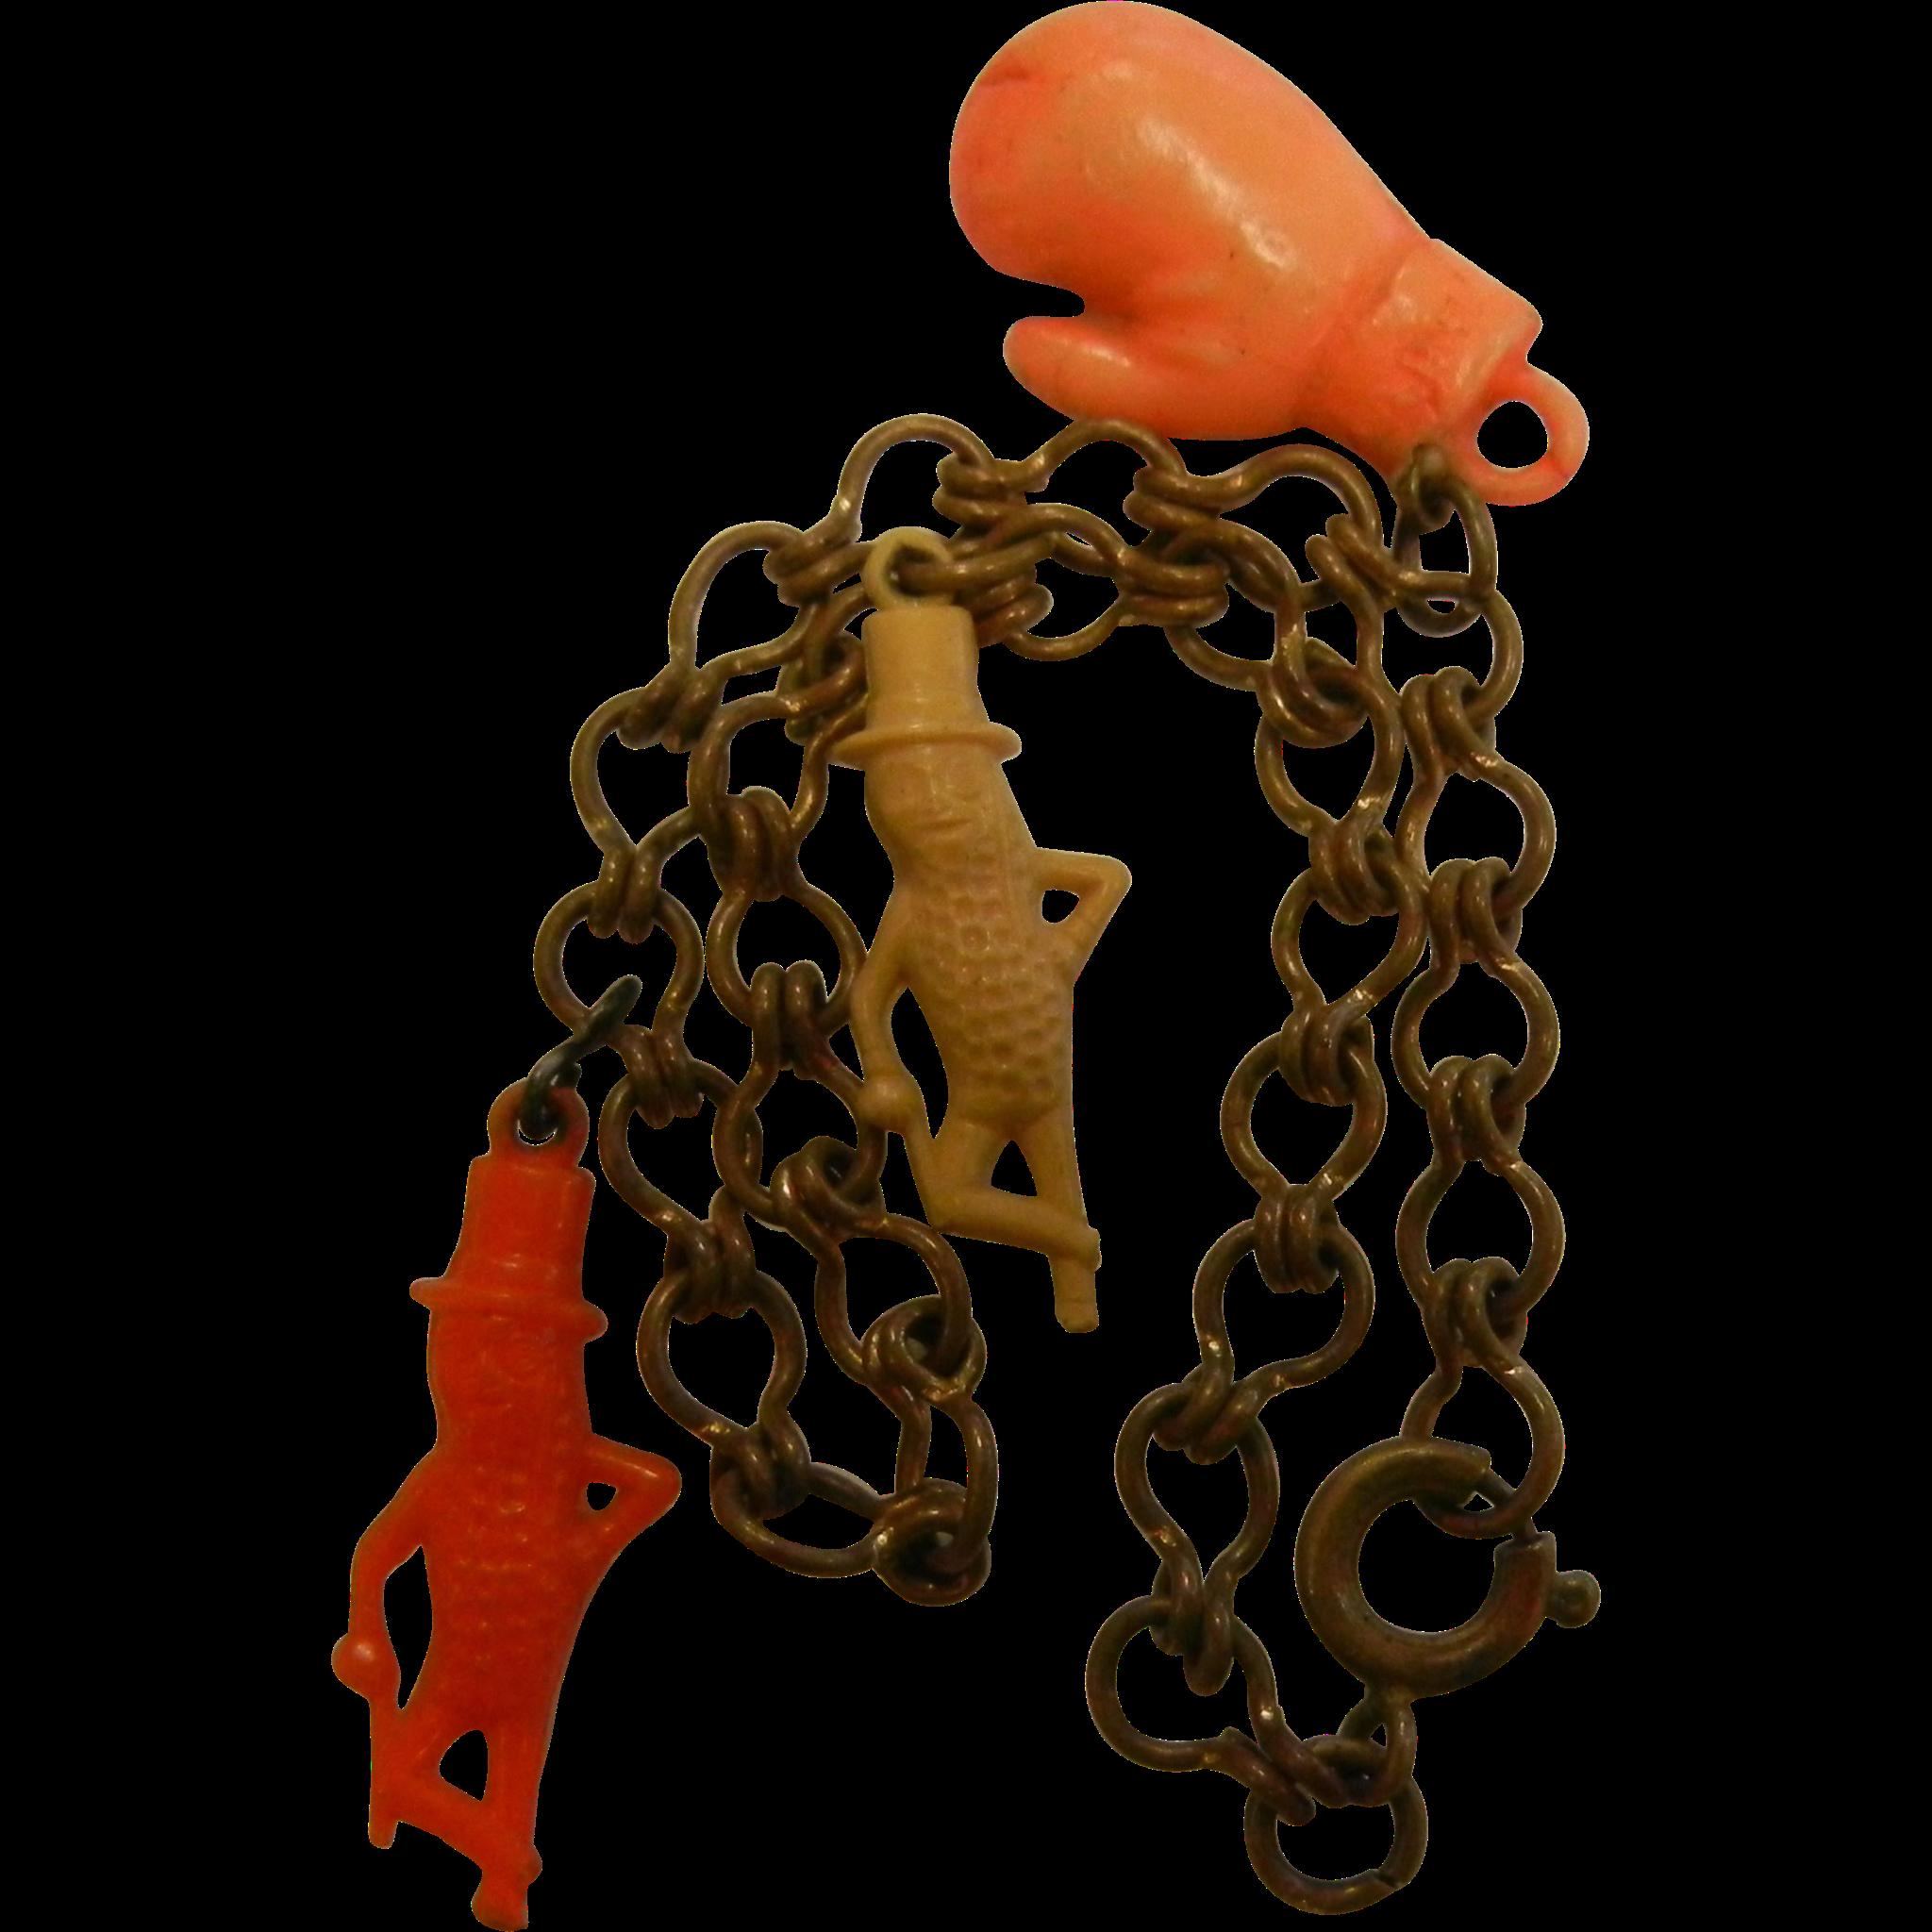 Vintage 1950's Celluloid Plastic Mr. Peanut Charm Bracelet w/ Three Charms